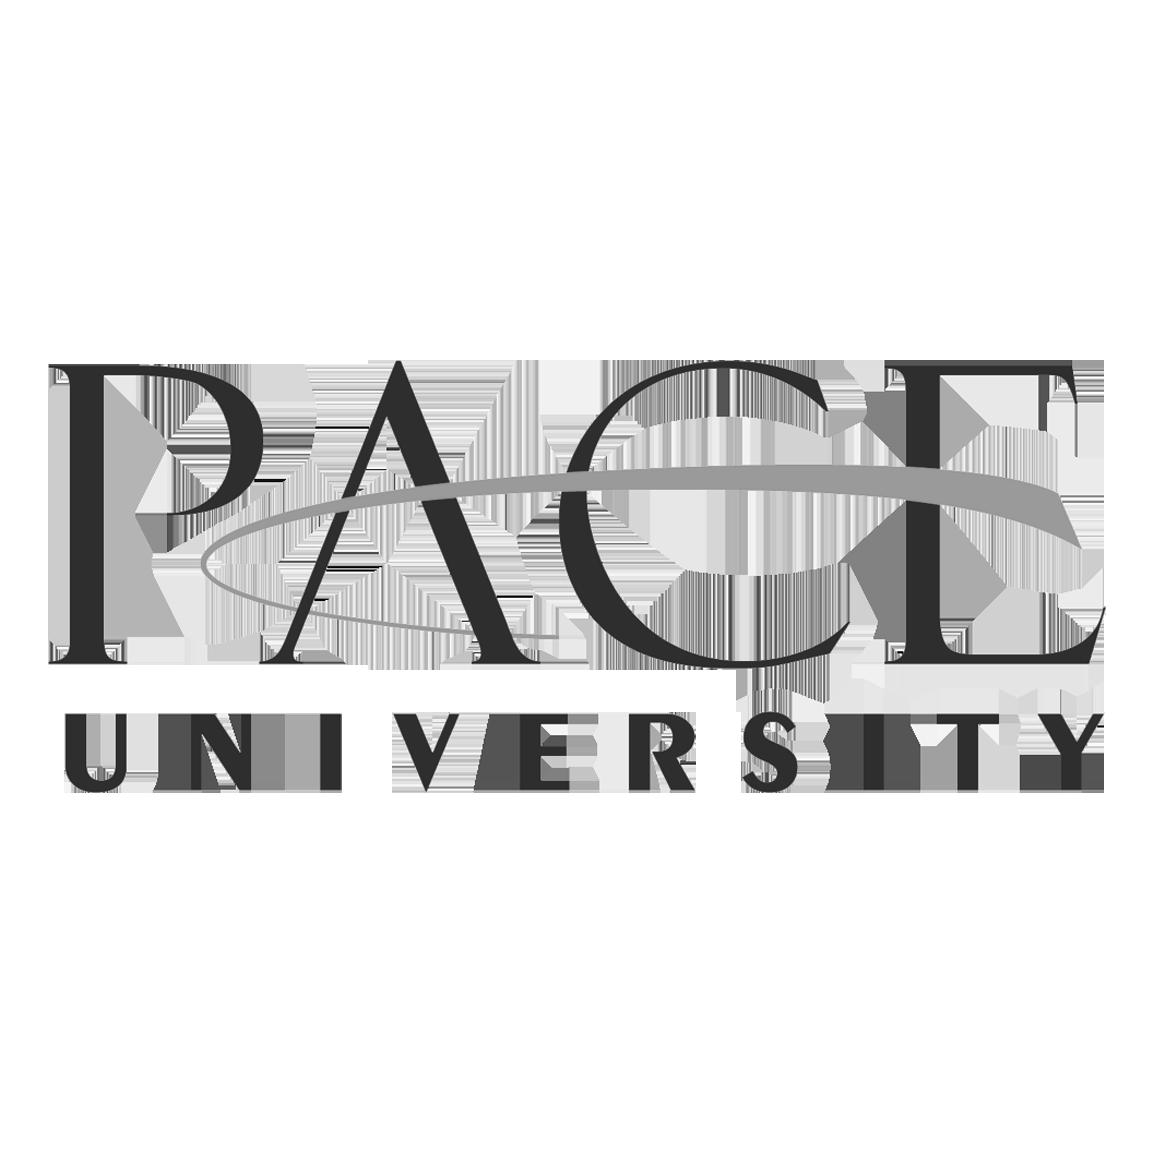 Pace_University_logo BW.png